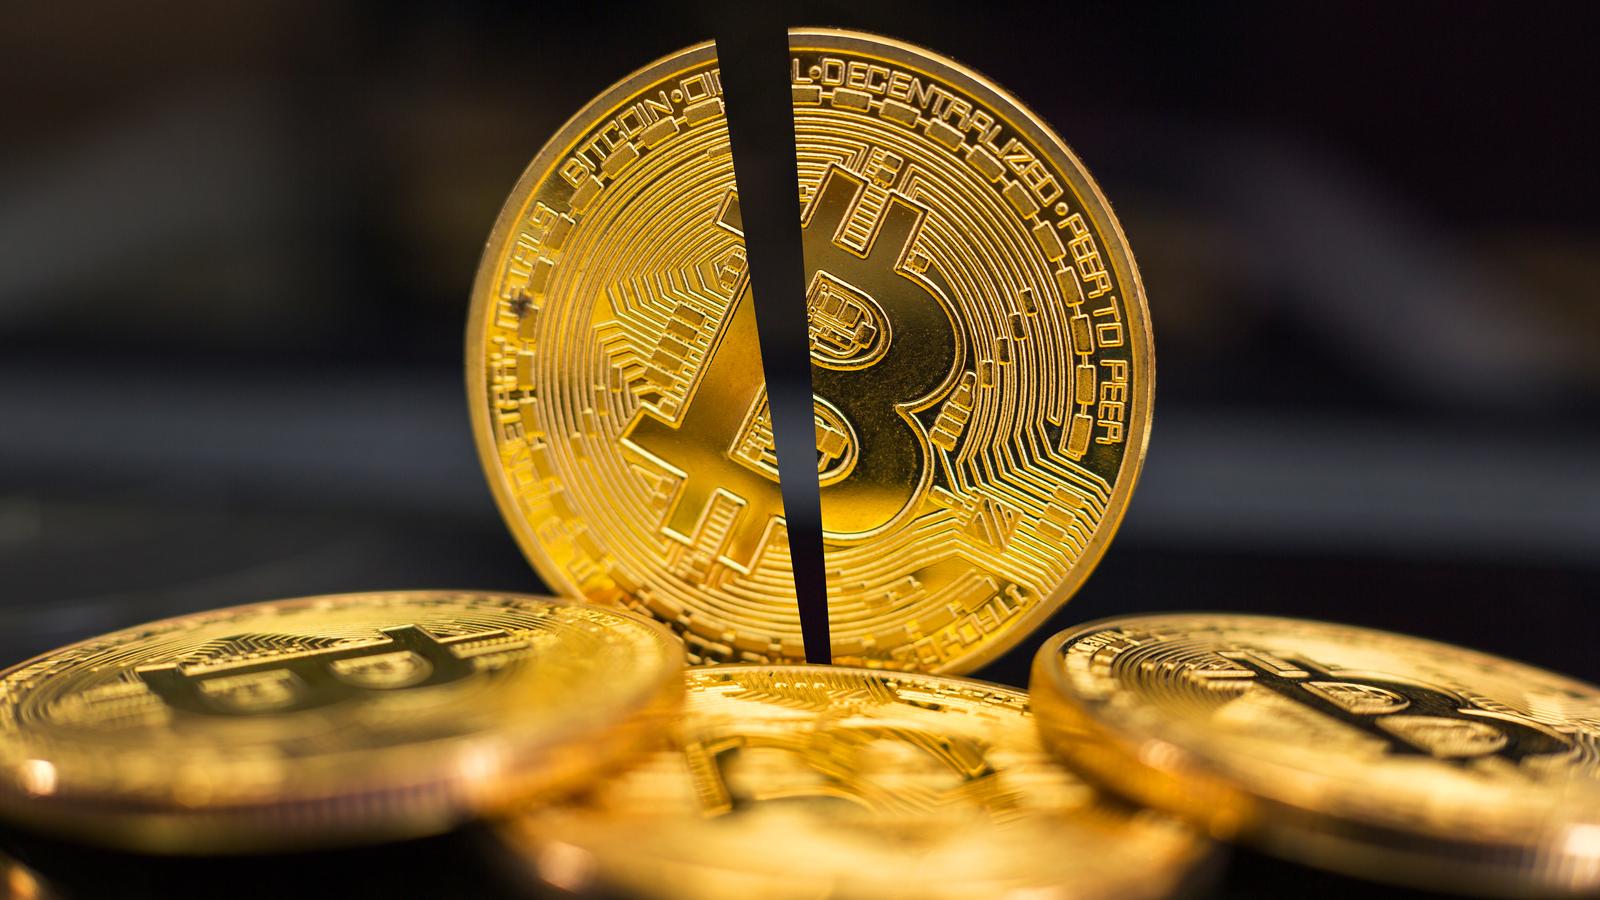 Gold Bitcoin Token split in half